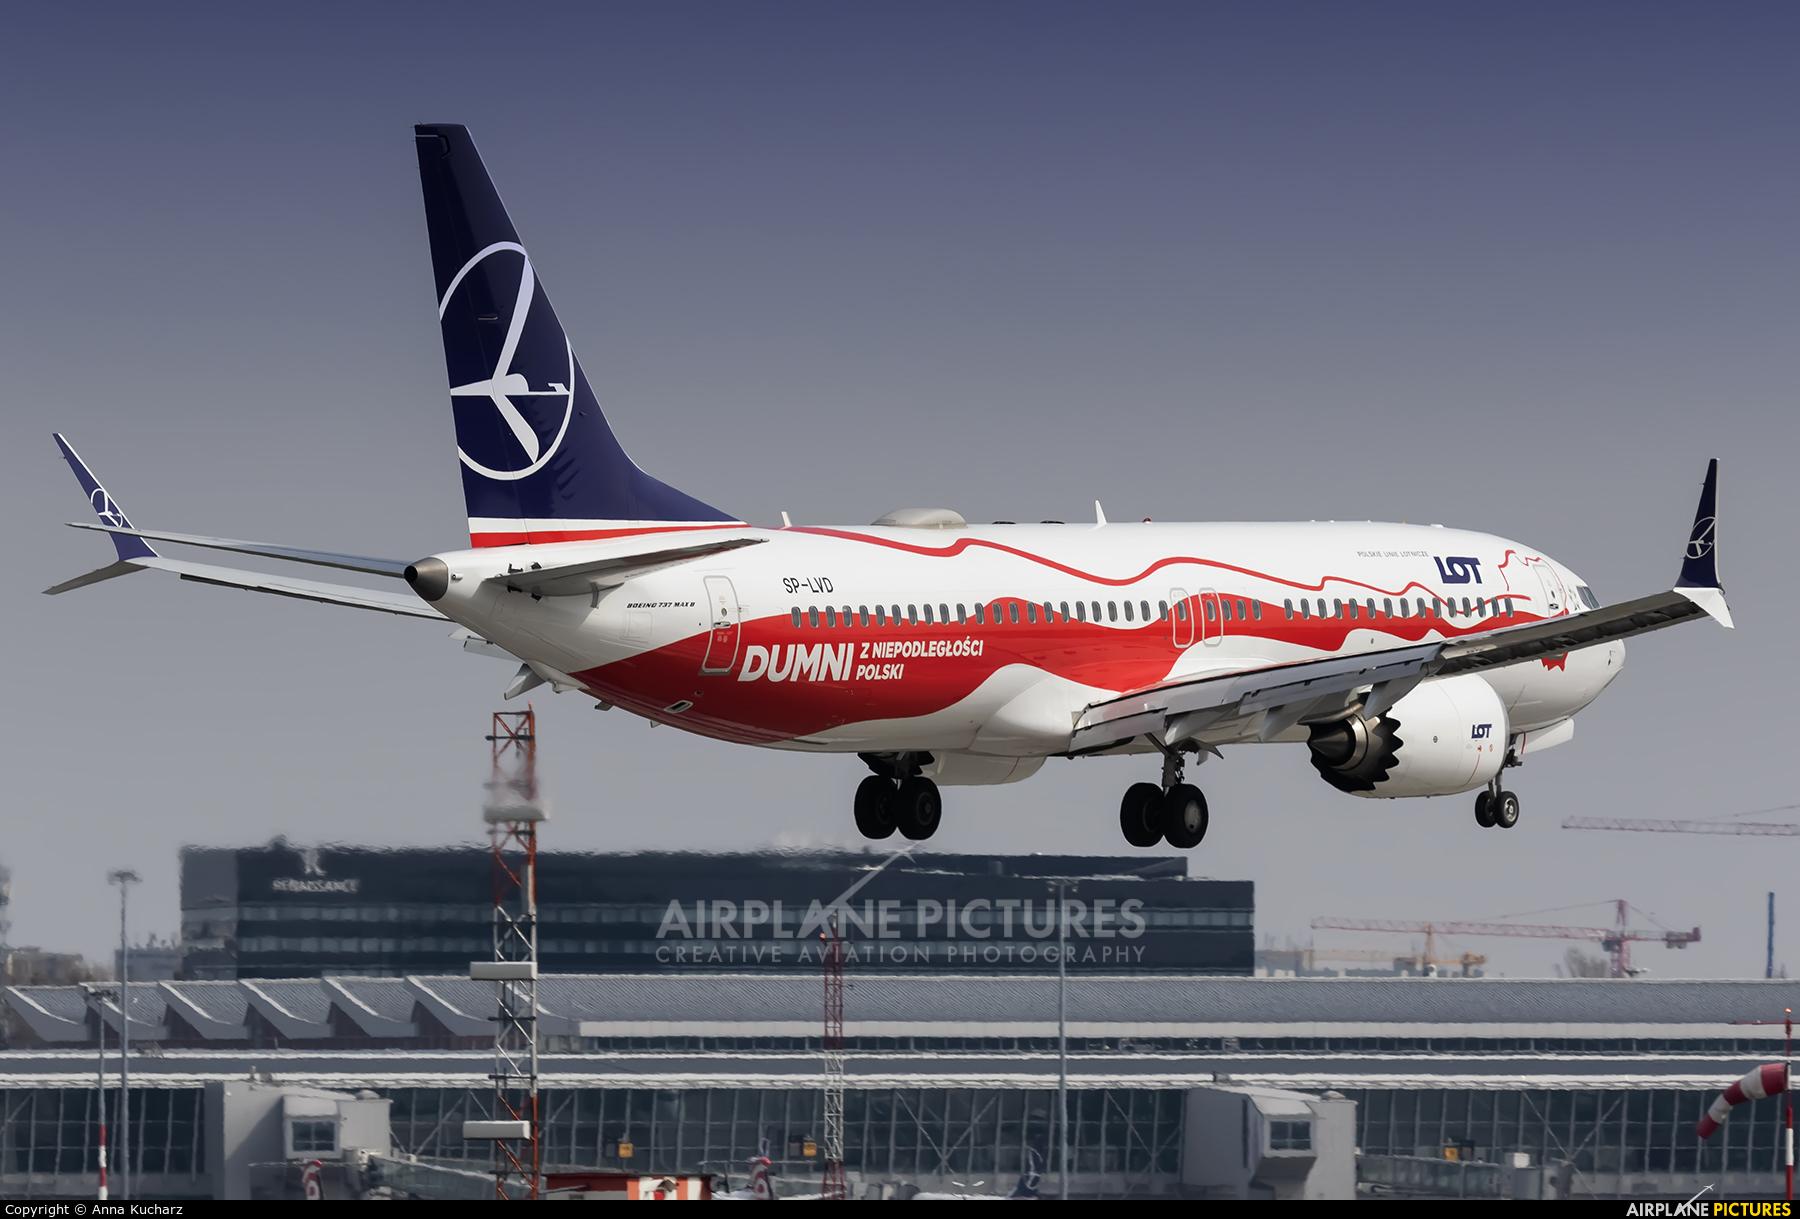 LOT - Polish Airlines SP-LVD aircraft at Warsaw - Frederic Chopin